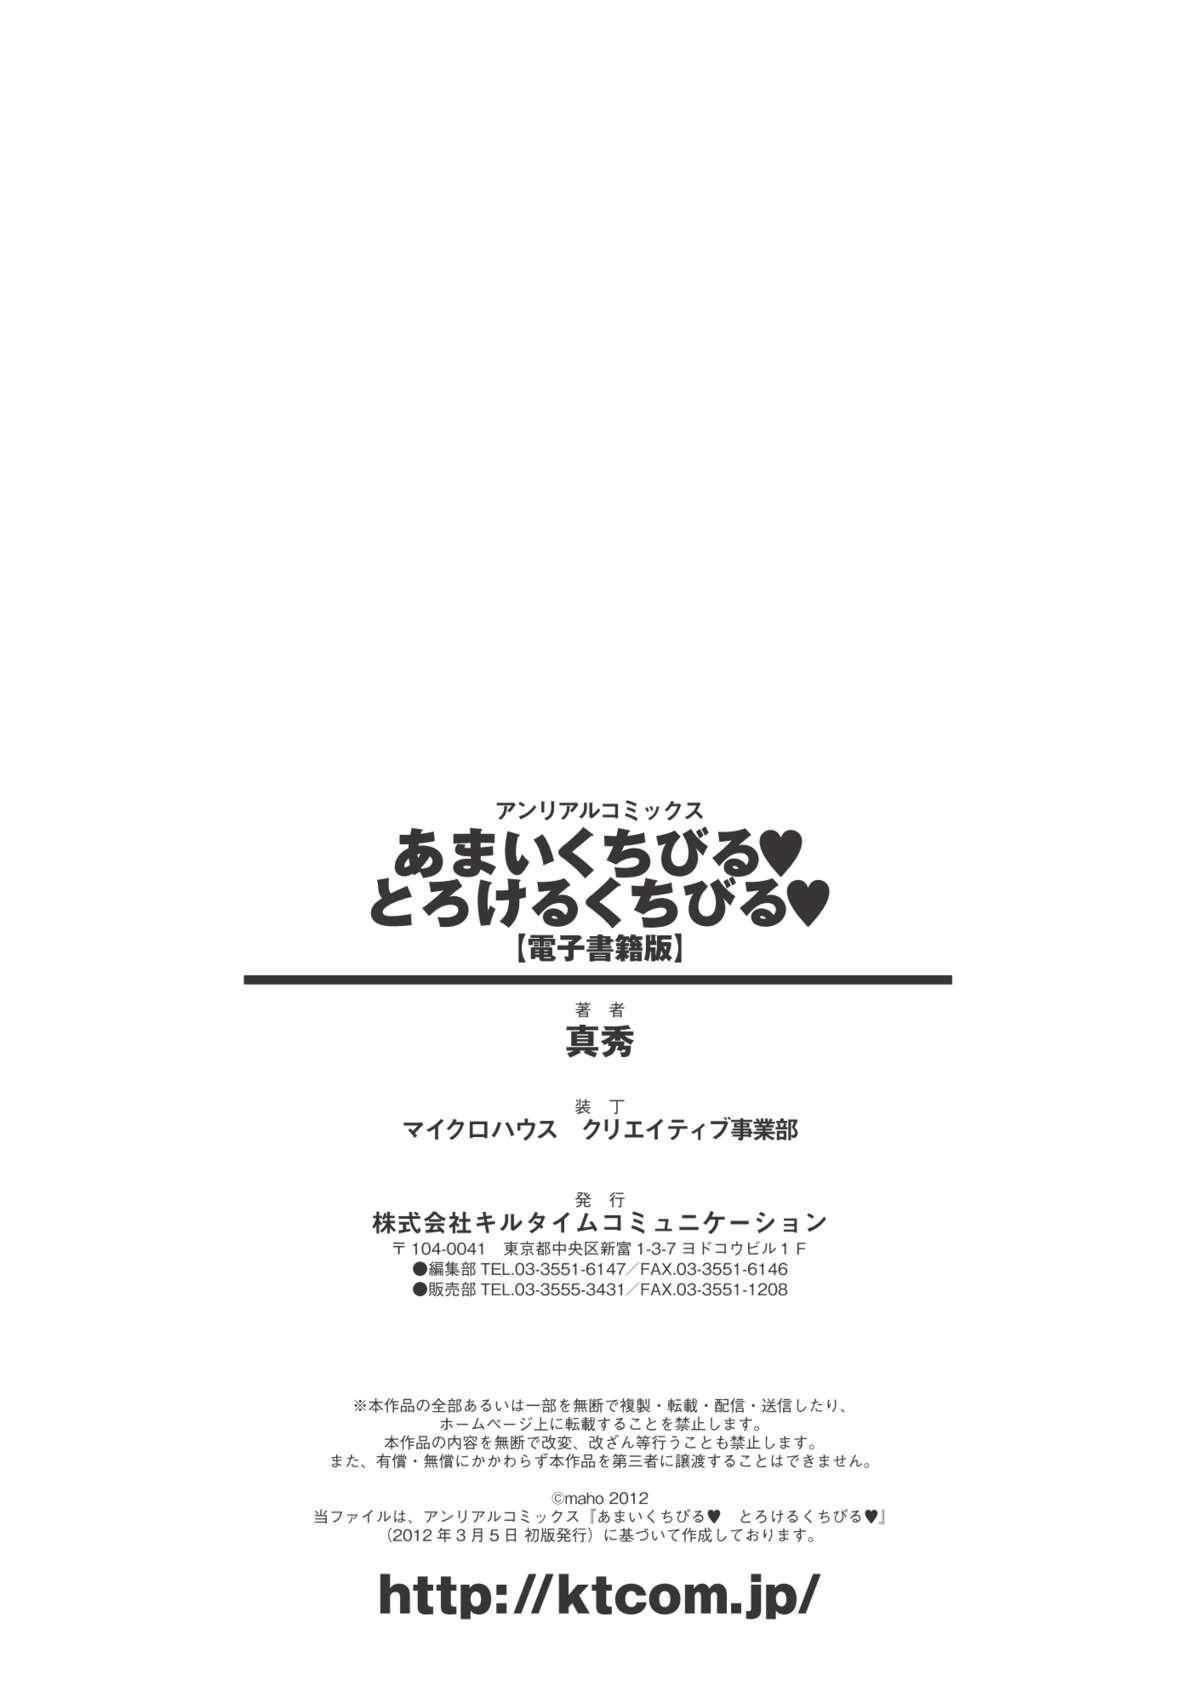 Amai Kuchibiru Torokeru Kuchibiru 174